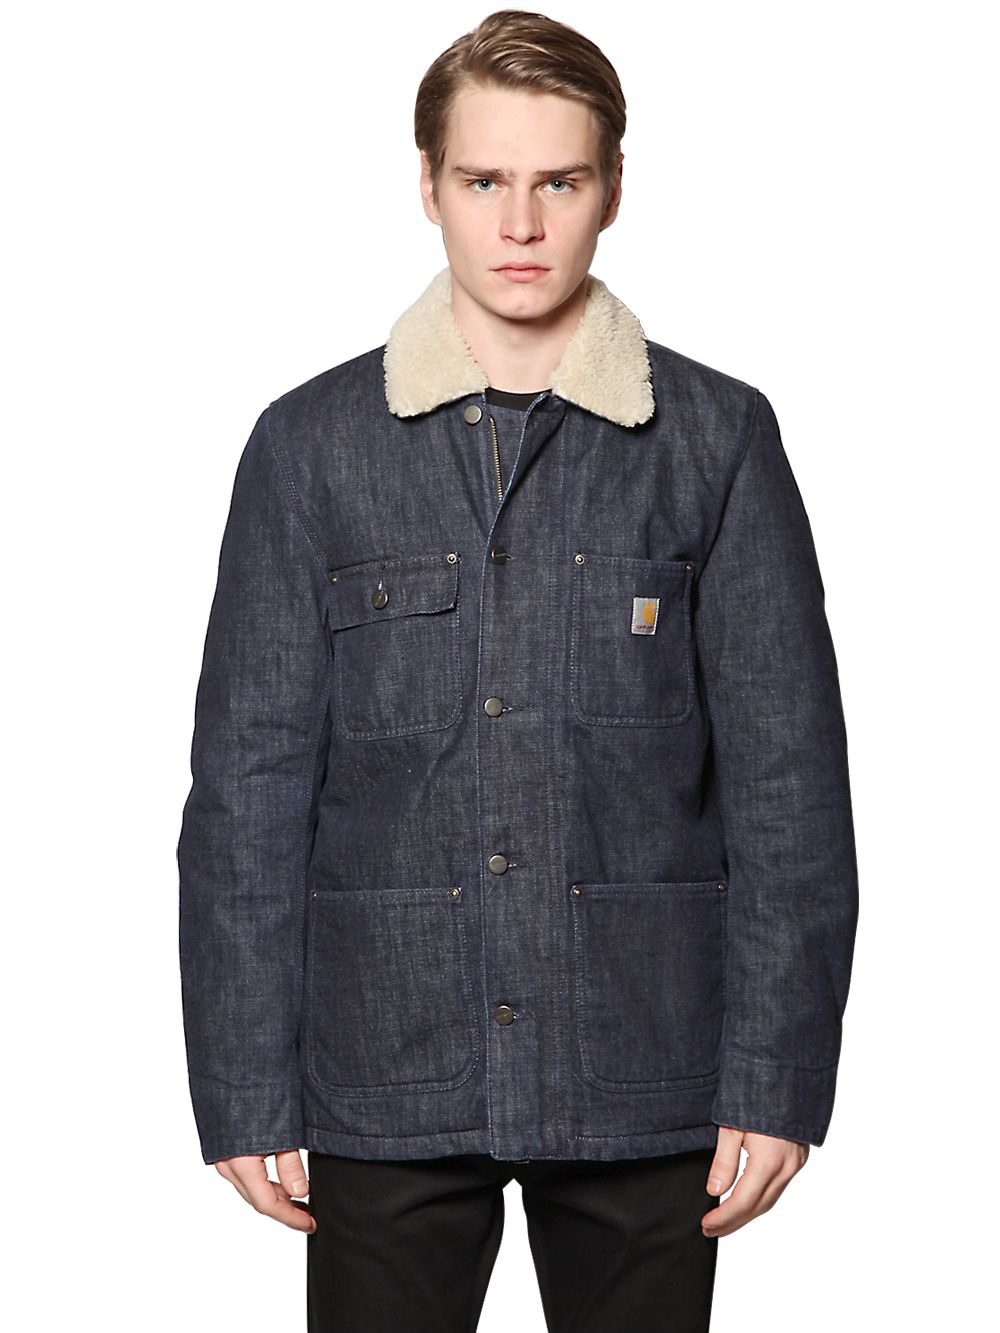 Lyst - Carhartt Phoenix Cotton Denim Jacket in Blue for Men